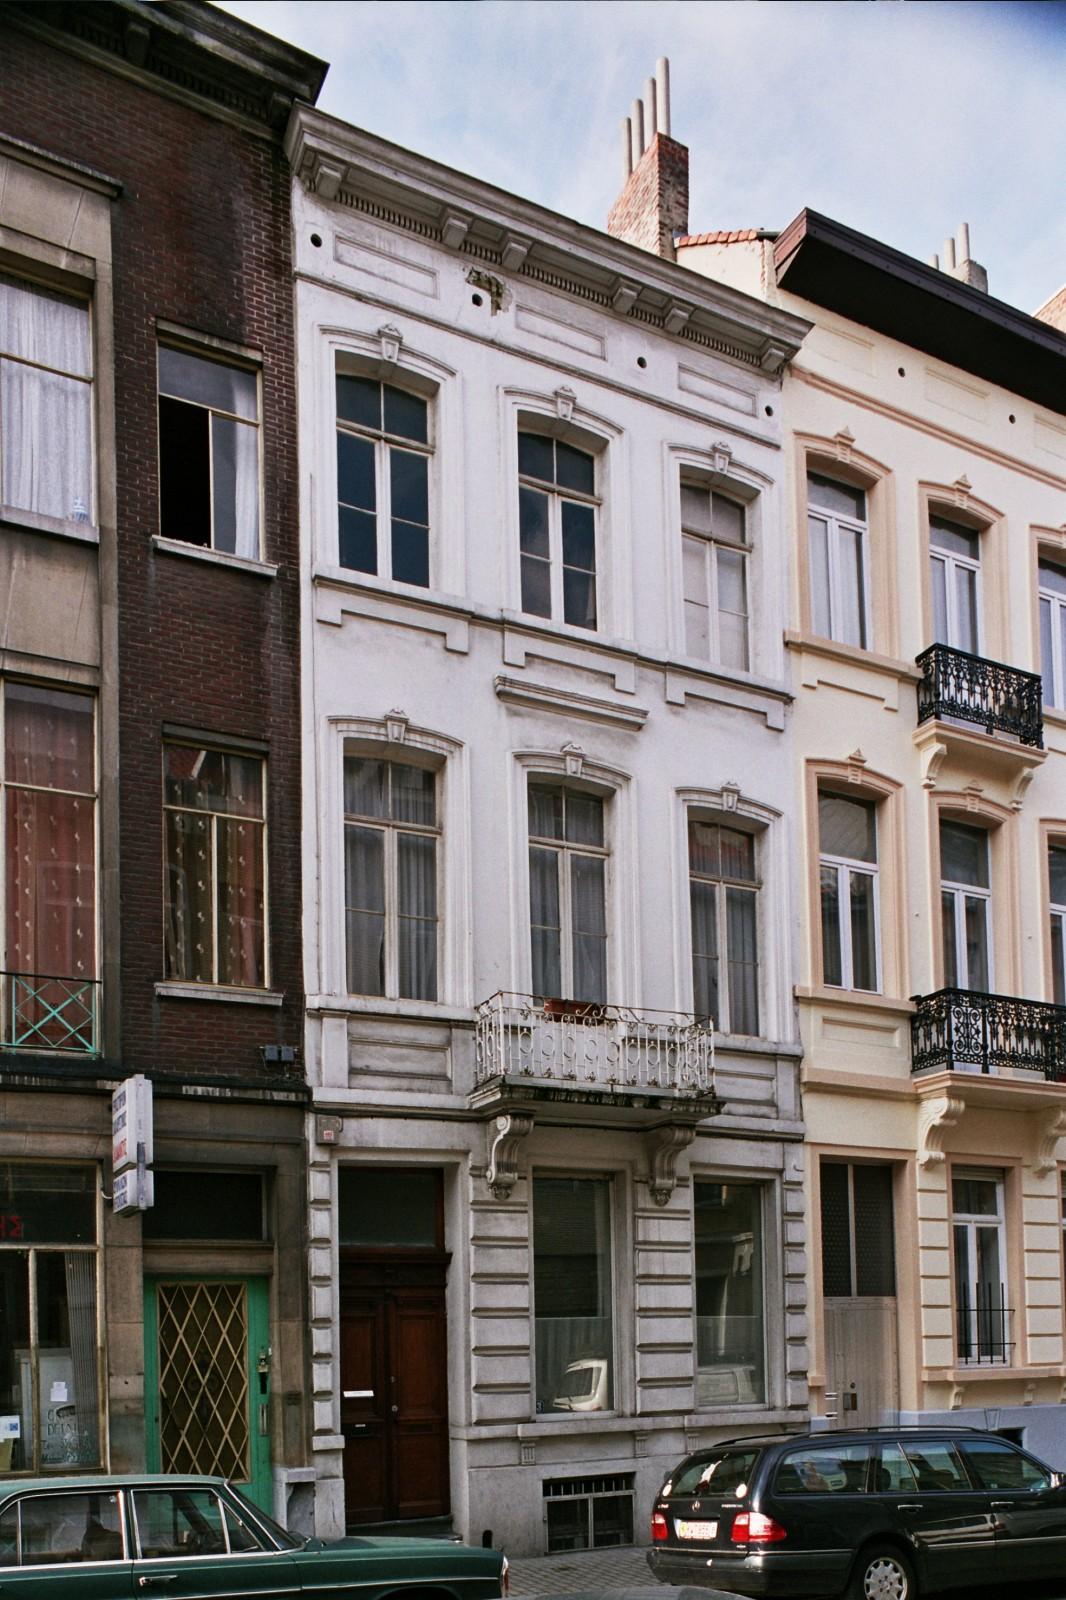 Zwedenstraat 53., 2004